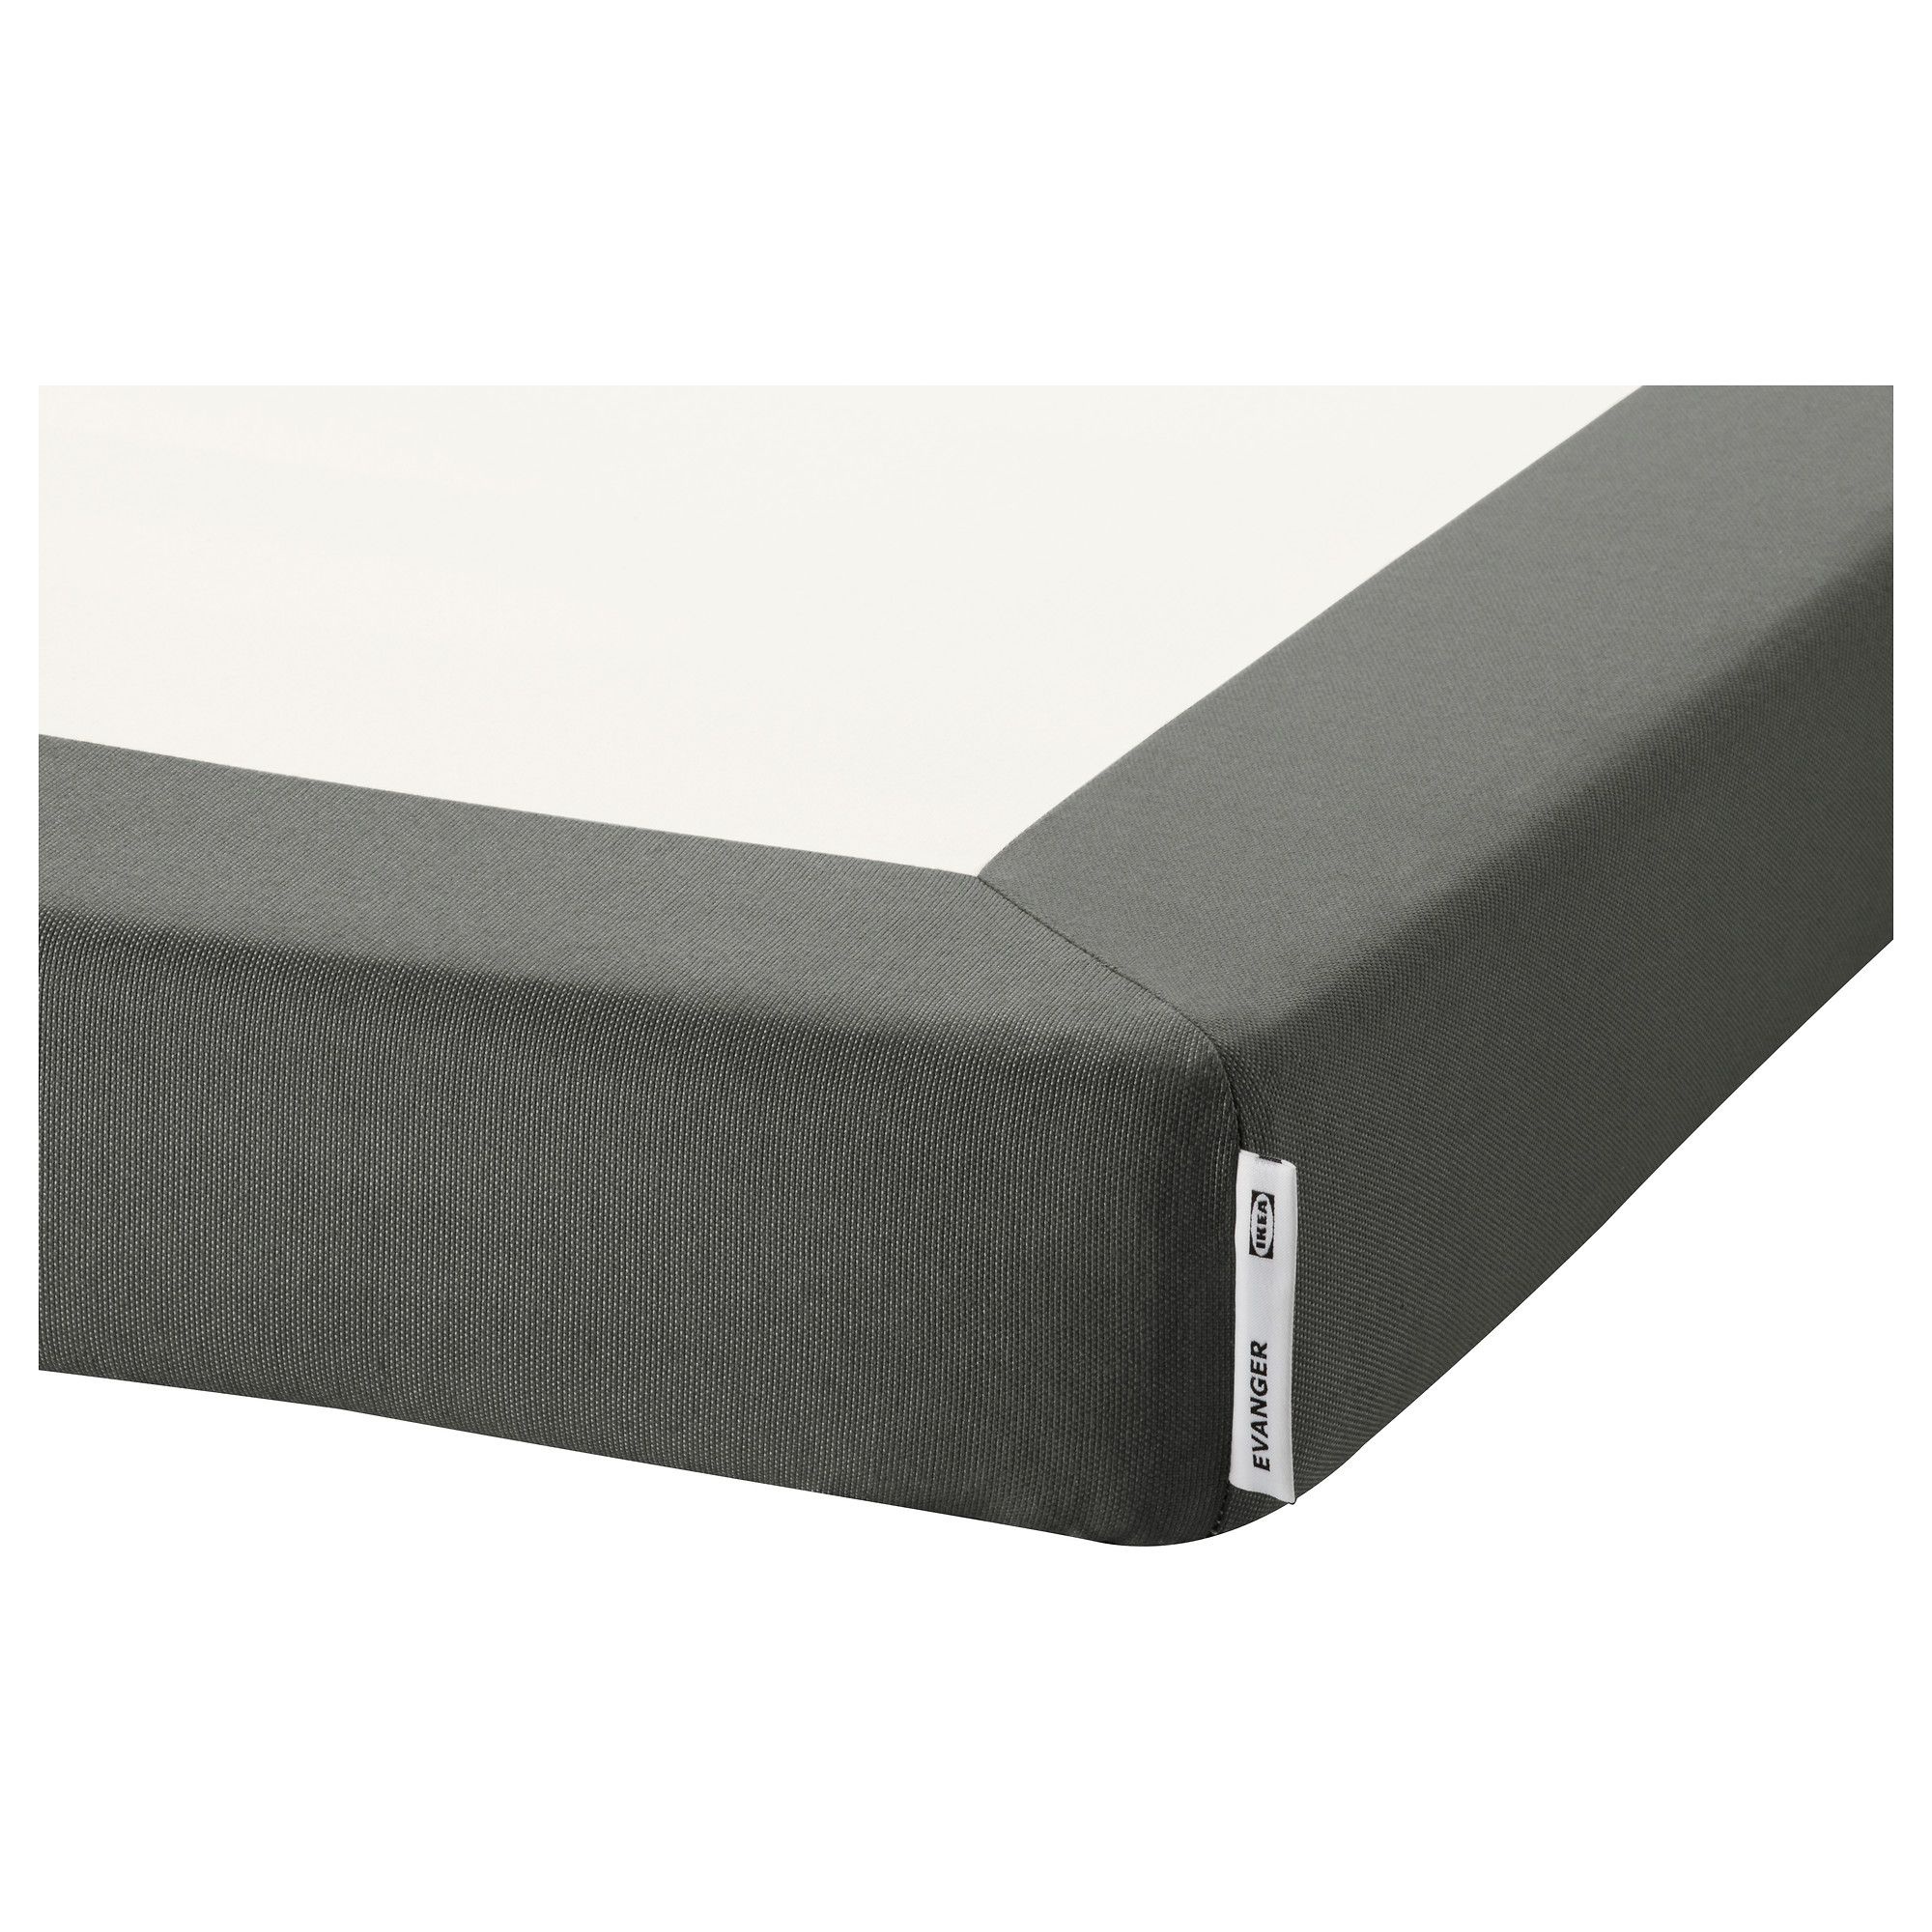 evanger support matelas 90x200 cm gris fonc ikea comprado vieux pinterest. Black Bedroom Furniture Sets. Home Design Ideas